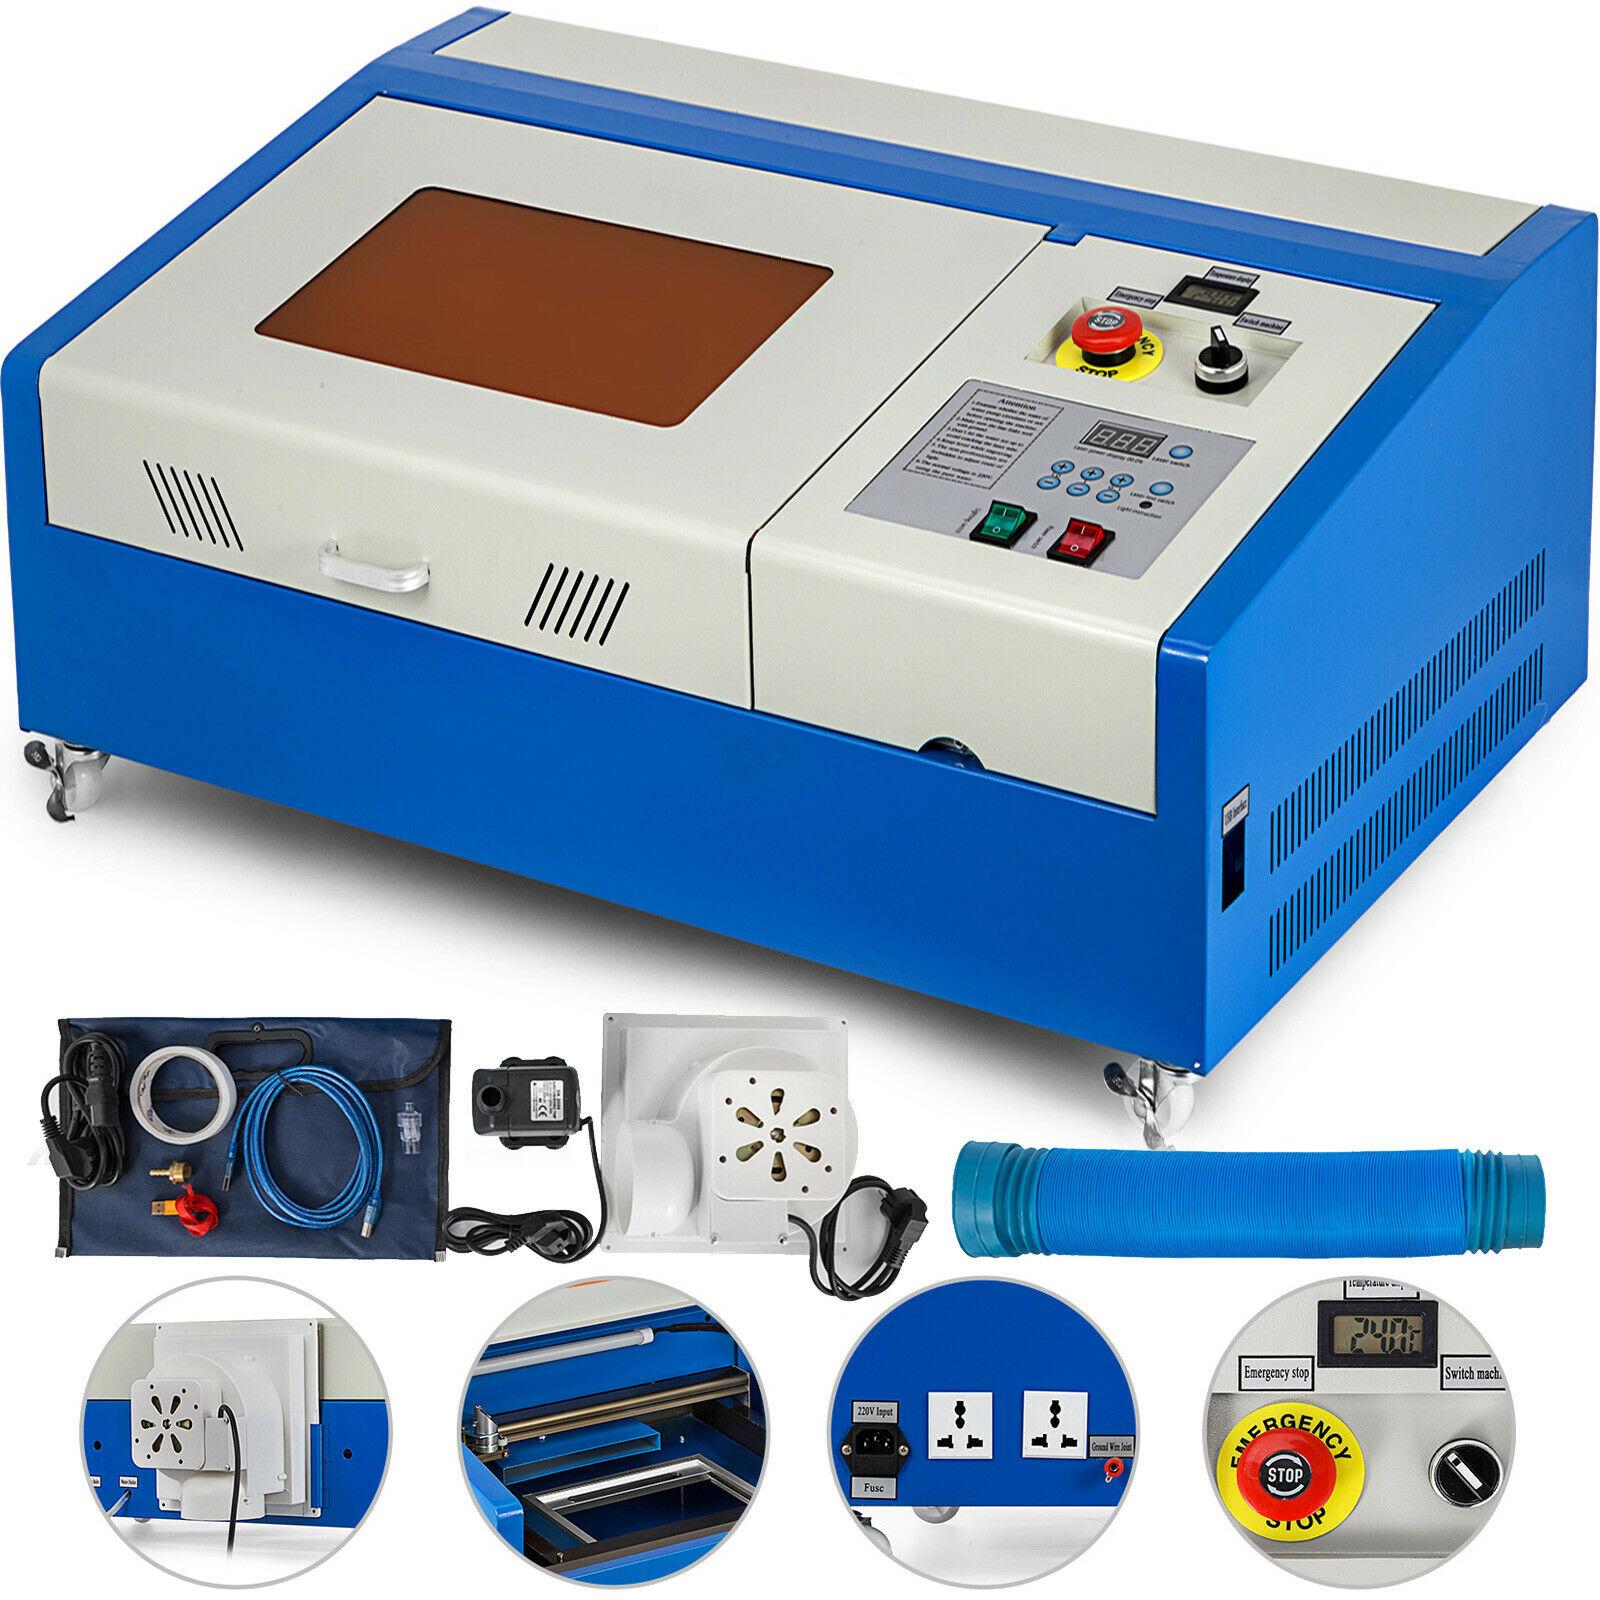 Máquina grabadora láser CO2 40W cortador de grabado máquina de grabado